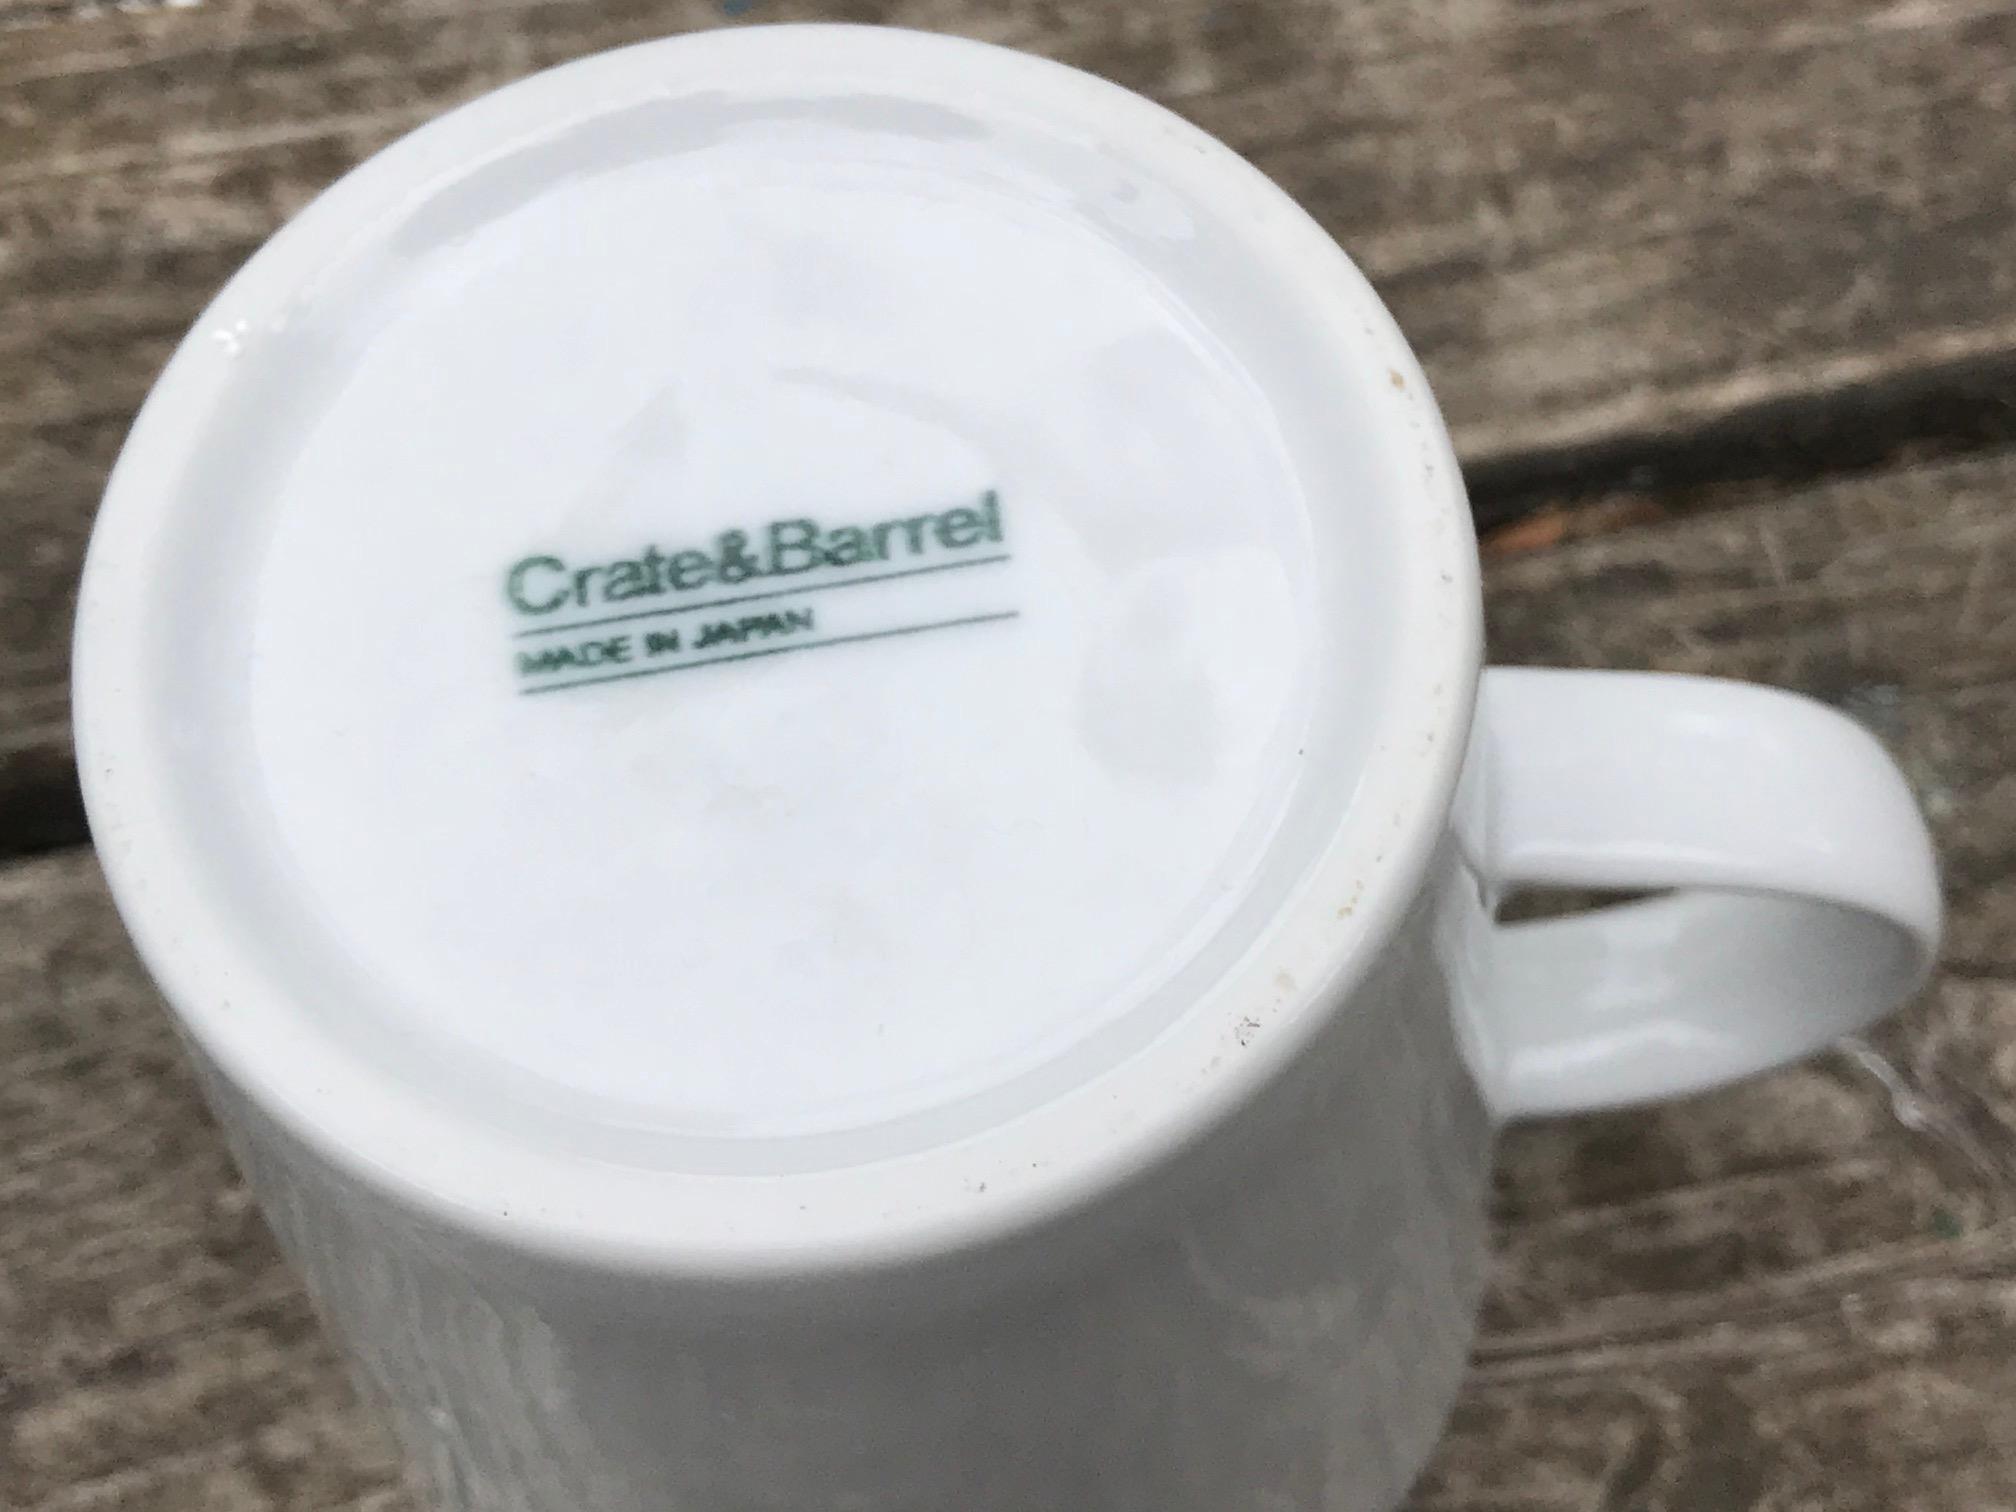 Crate & Barrel Made In Japan White Ceramic Mug